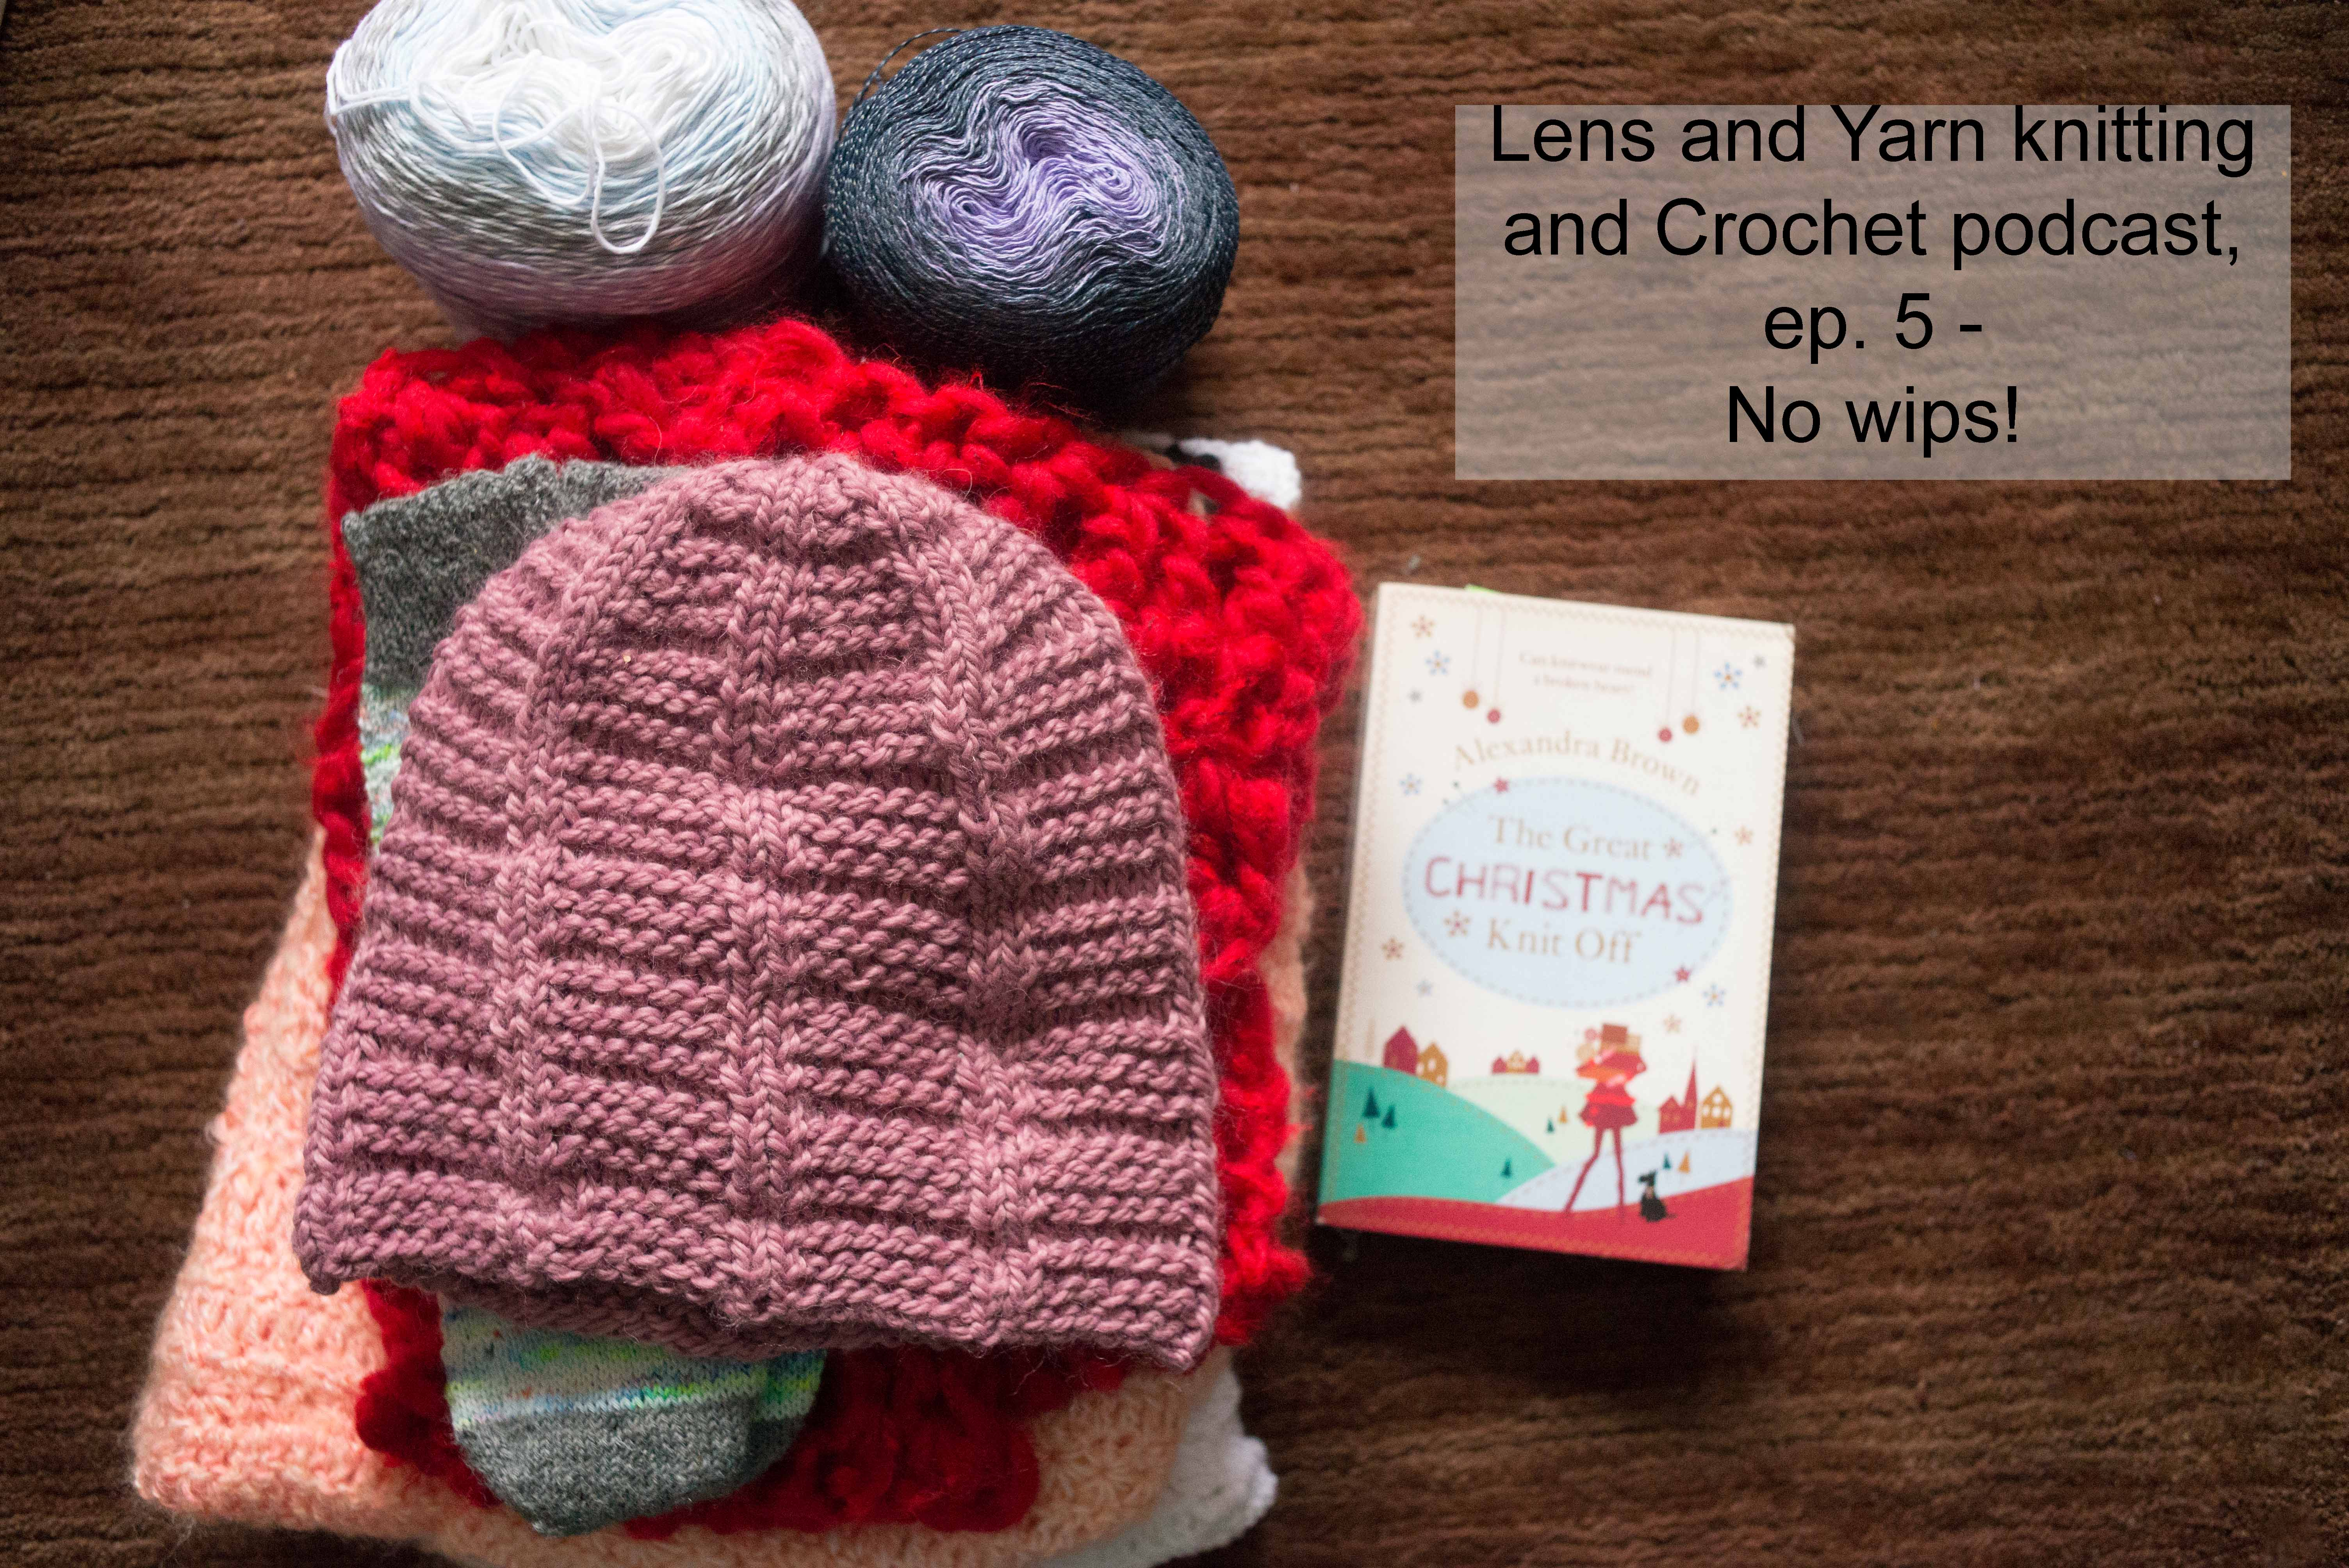 Lensandyarn Knitting and Crochet Podcast, ep. 5 – No wips!